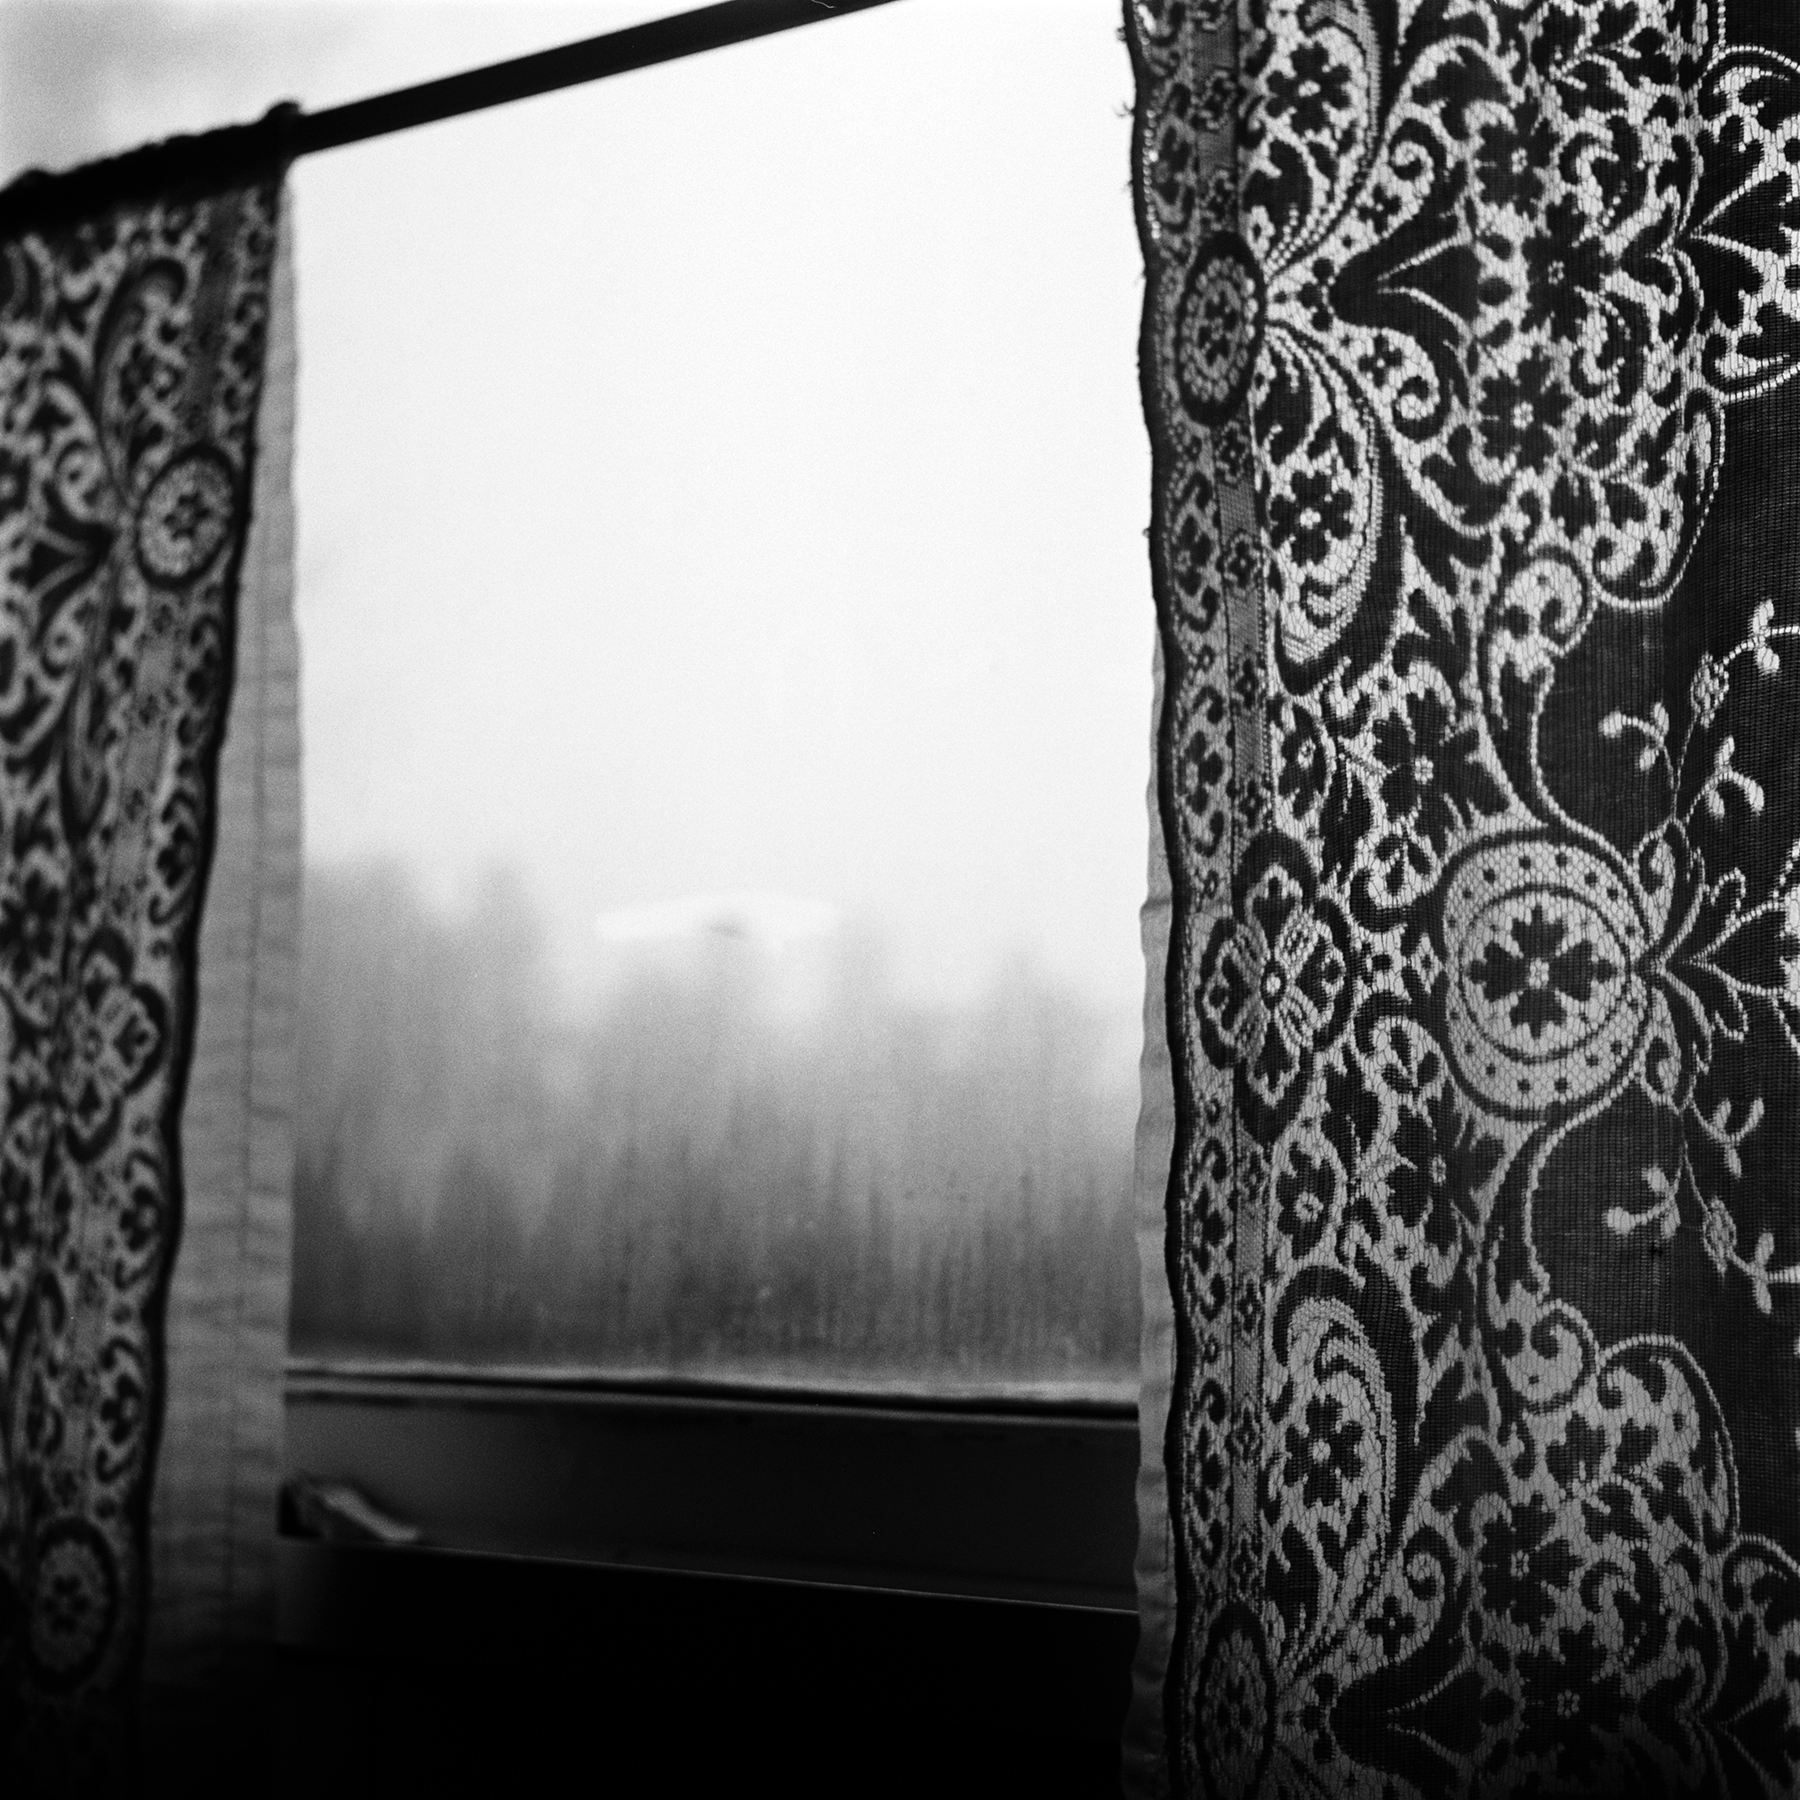 The Window | Rolleiflex 3.5 | Sarah Taft